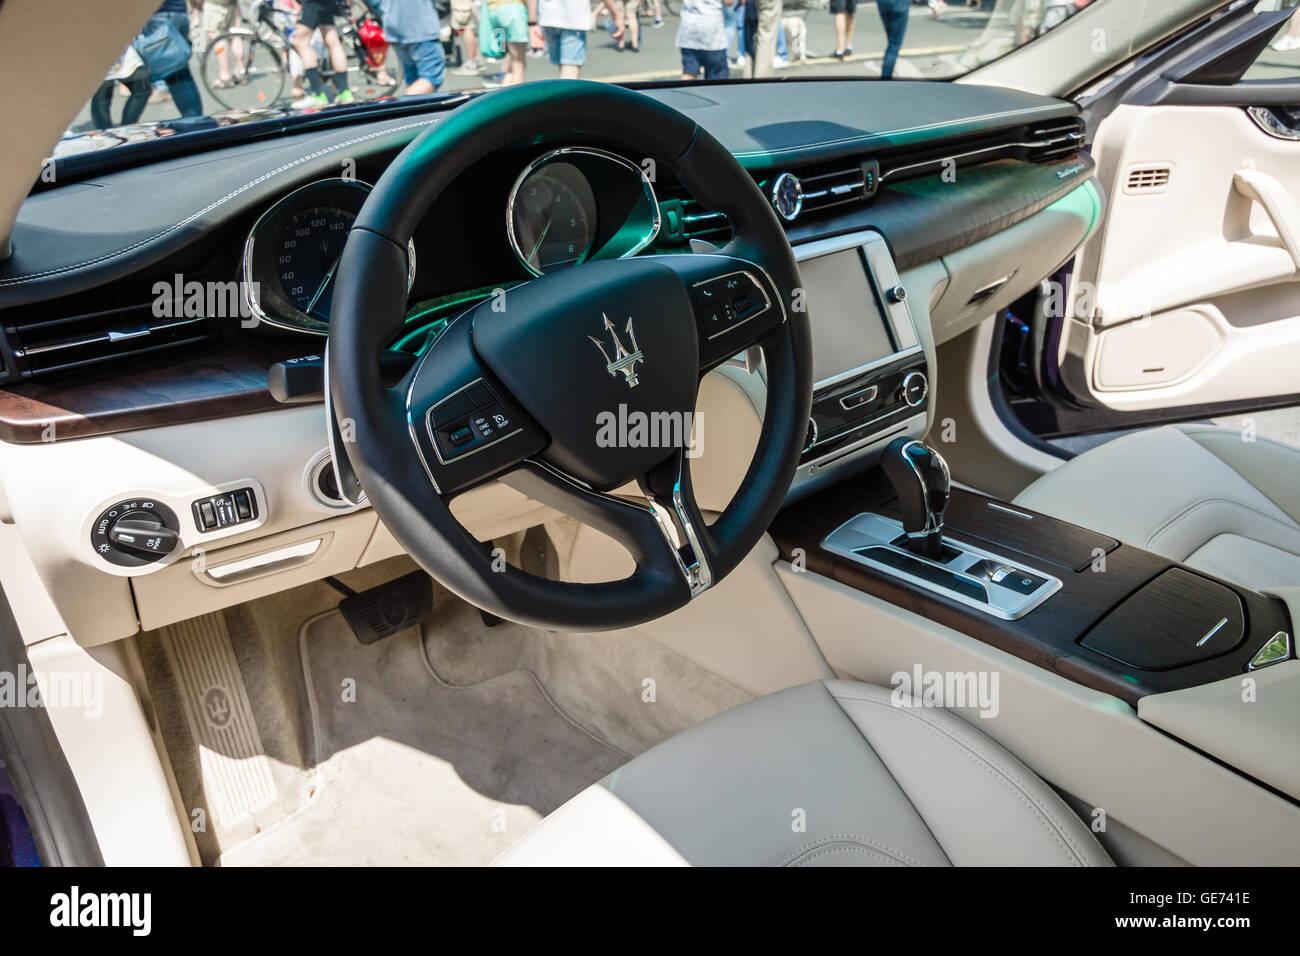 berlin june 05 2016 interior of full size luxury car maserati stock photo royalty free. Black Bedroom Furniture Sets. Home Design Ideas